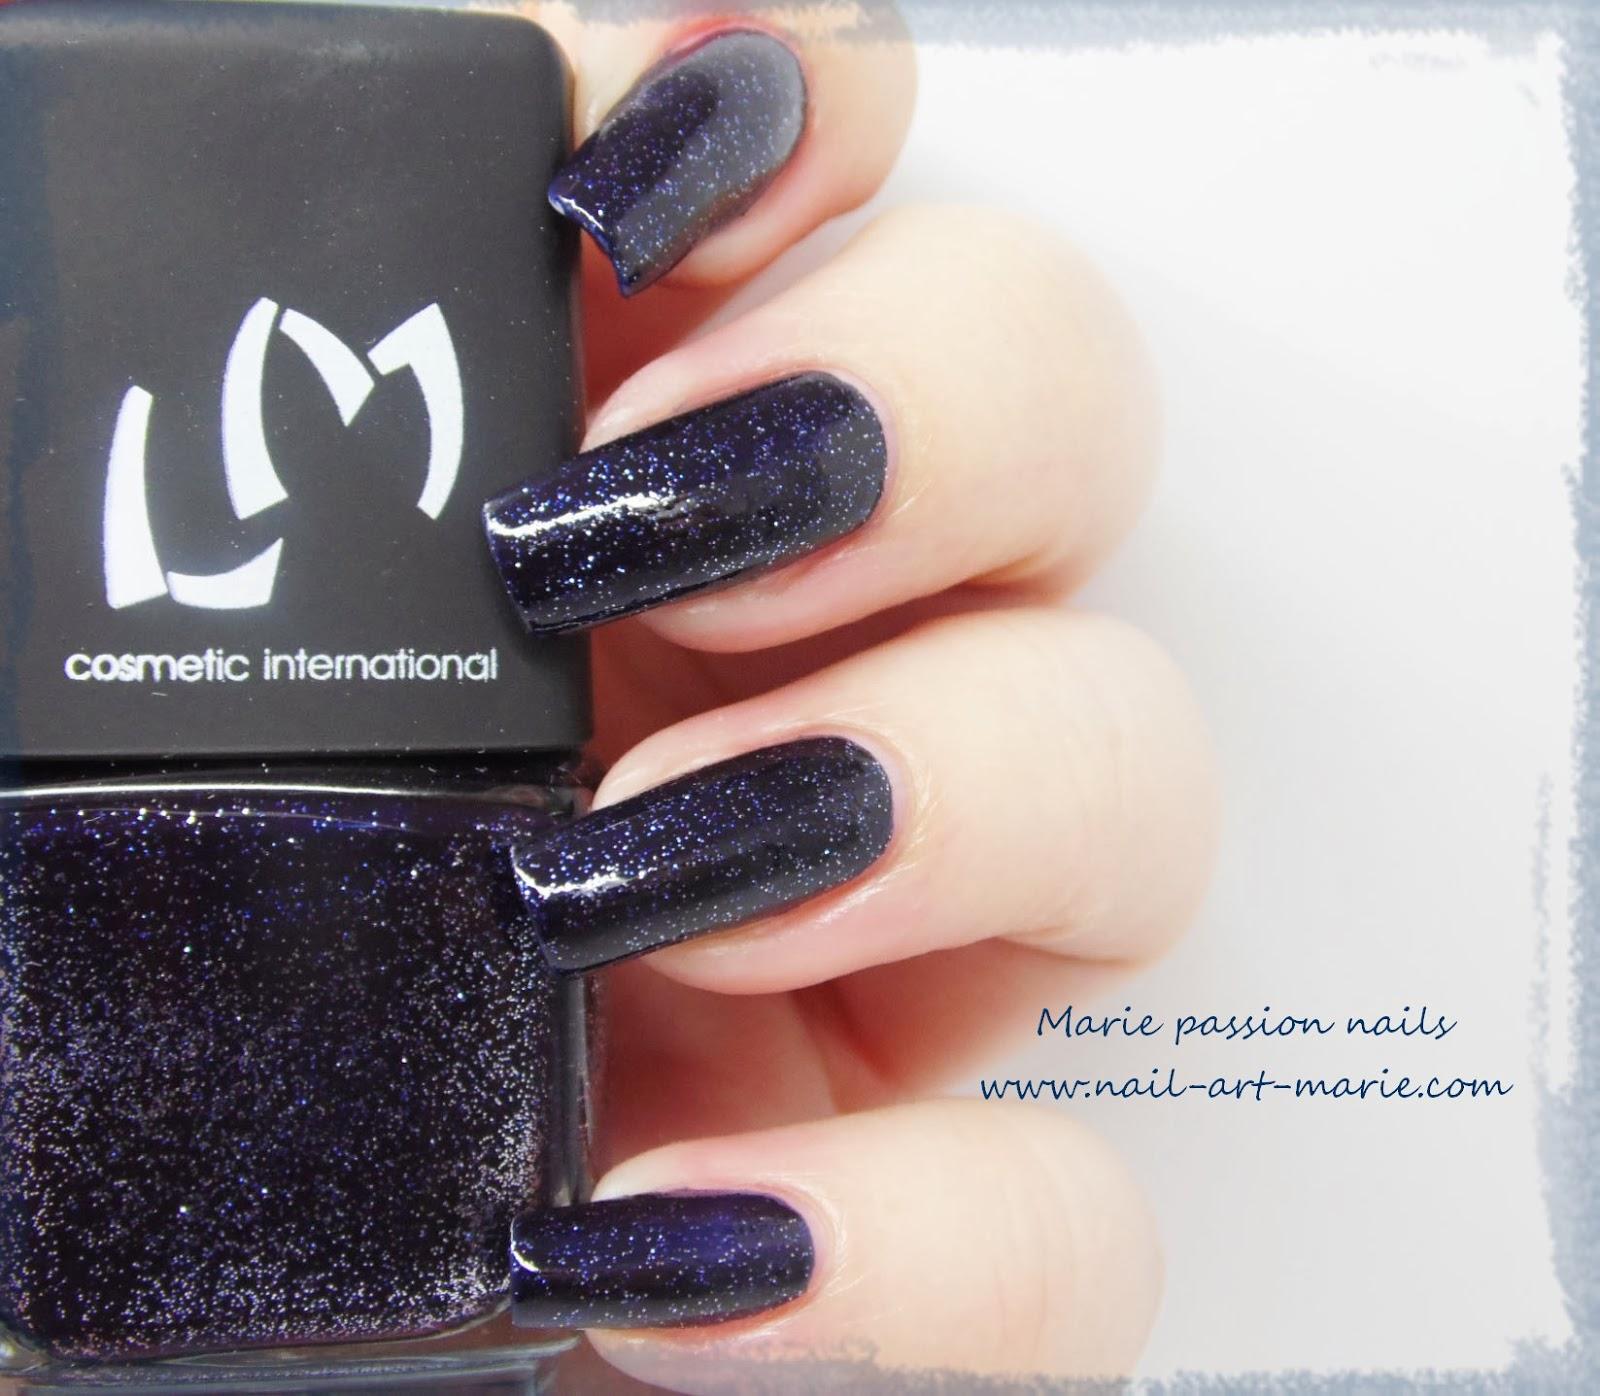 LM Cosmetic Tabarro3